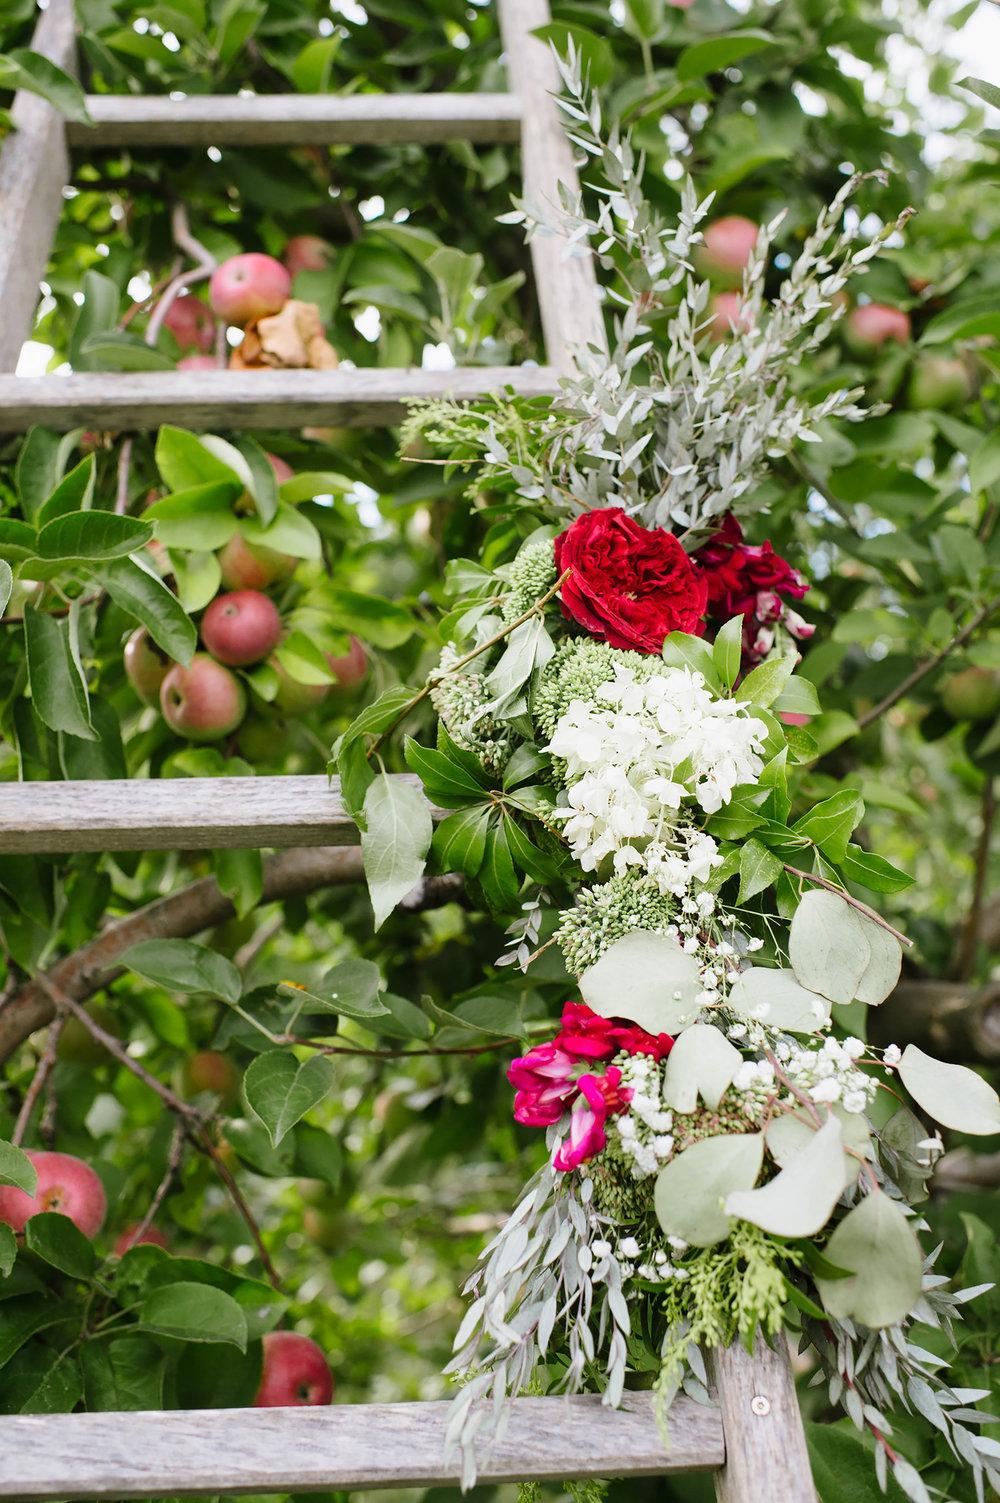 Details at Laura + Zach's wedding, Quonquont Farm